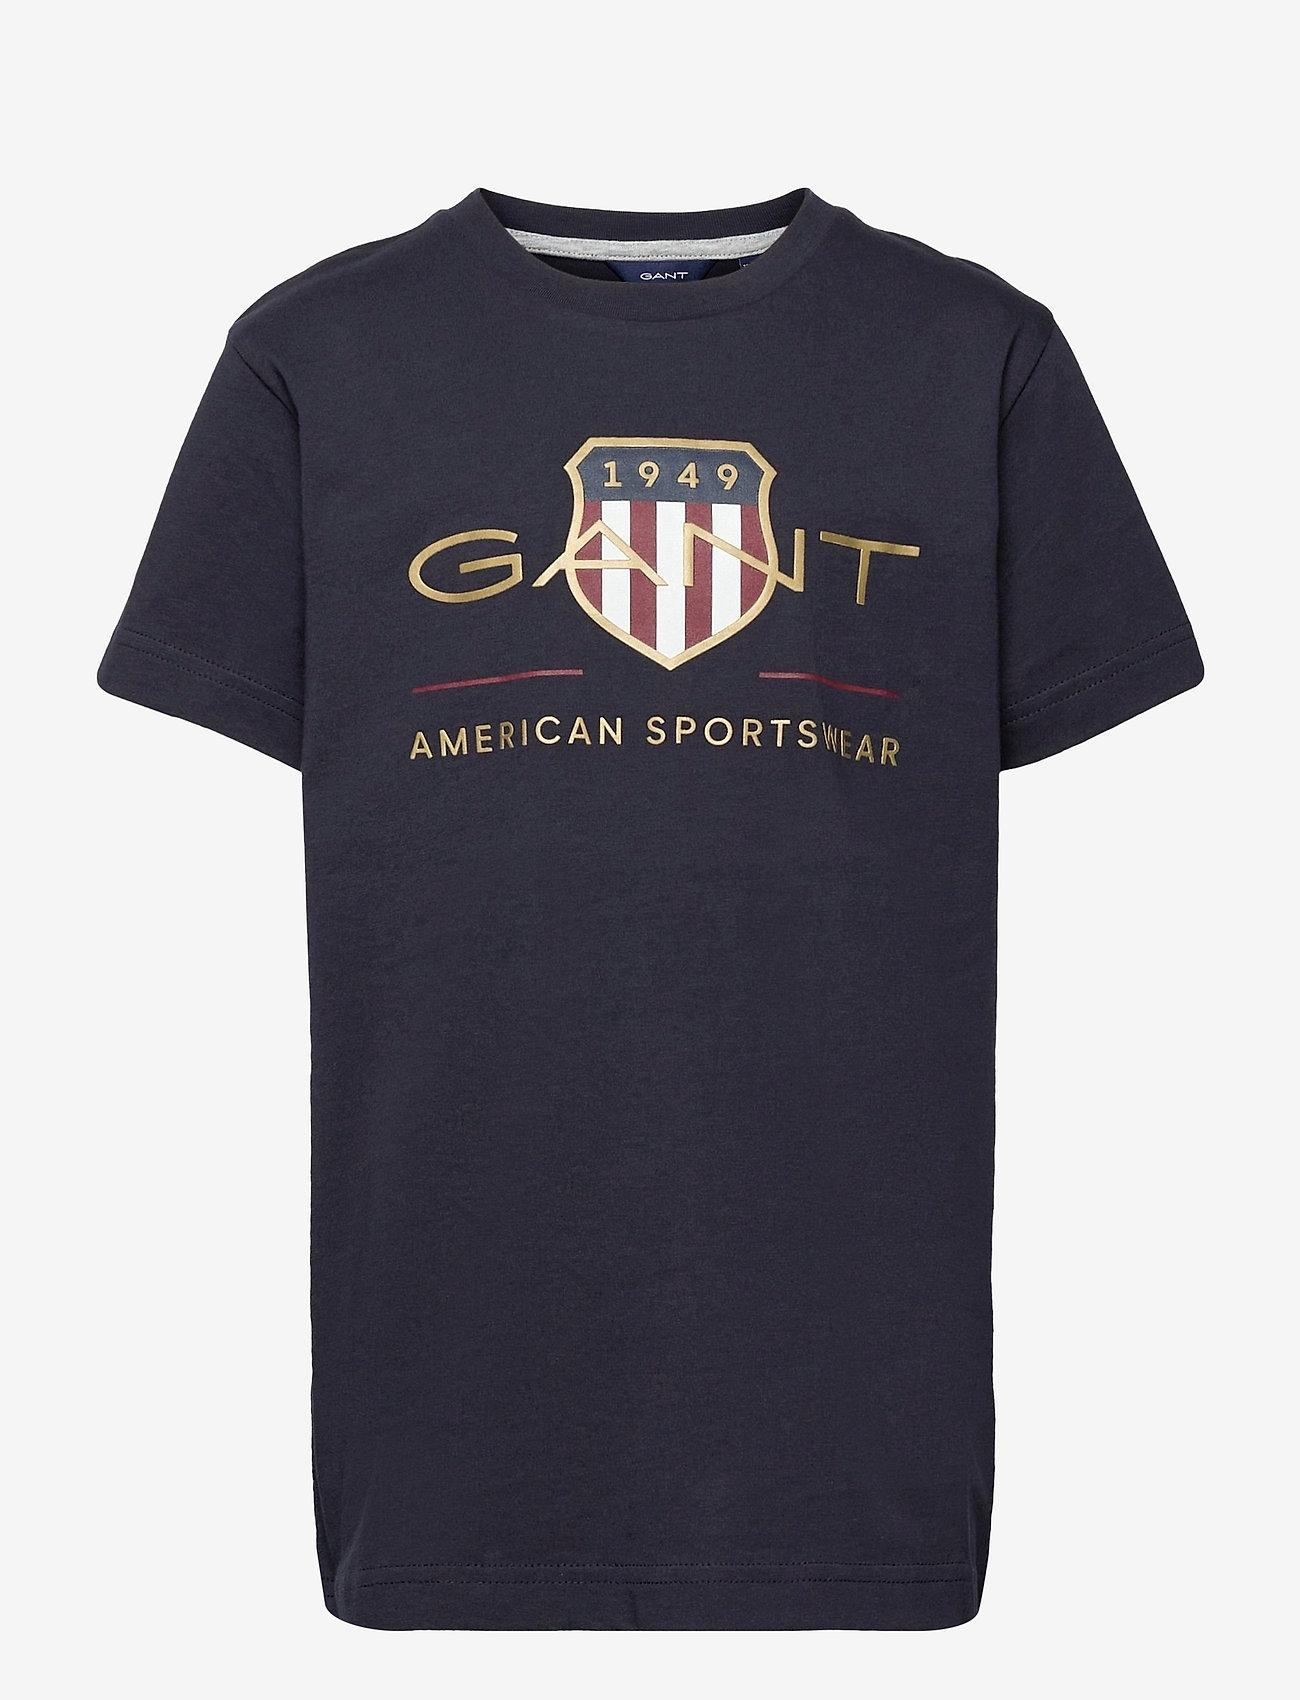 GANT - ARCHIVE SHIELD SS T-SHIRT - short-sleeved - evening blue - 0